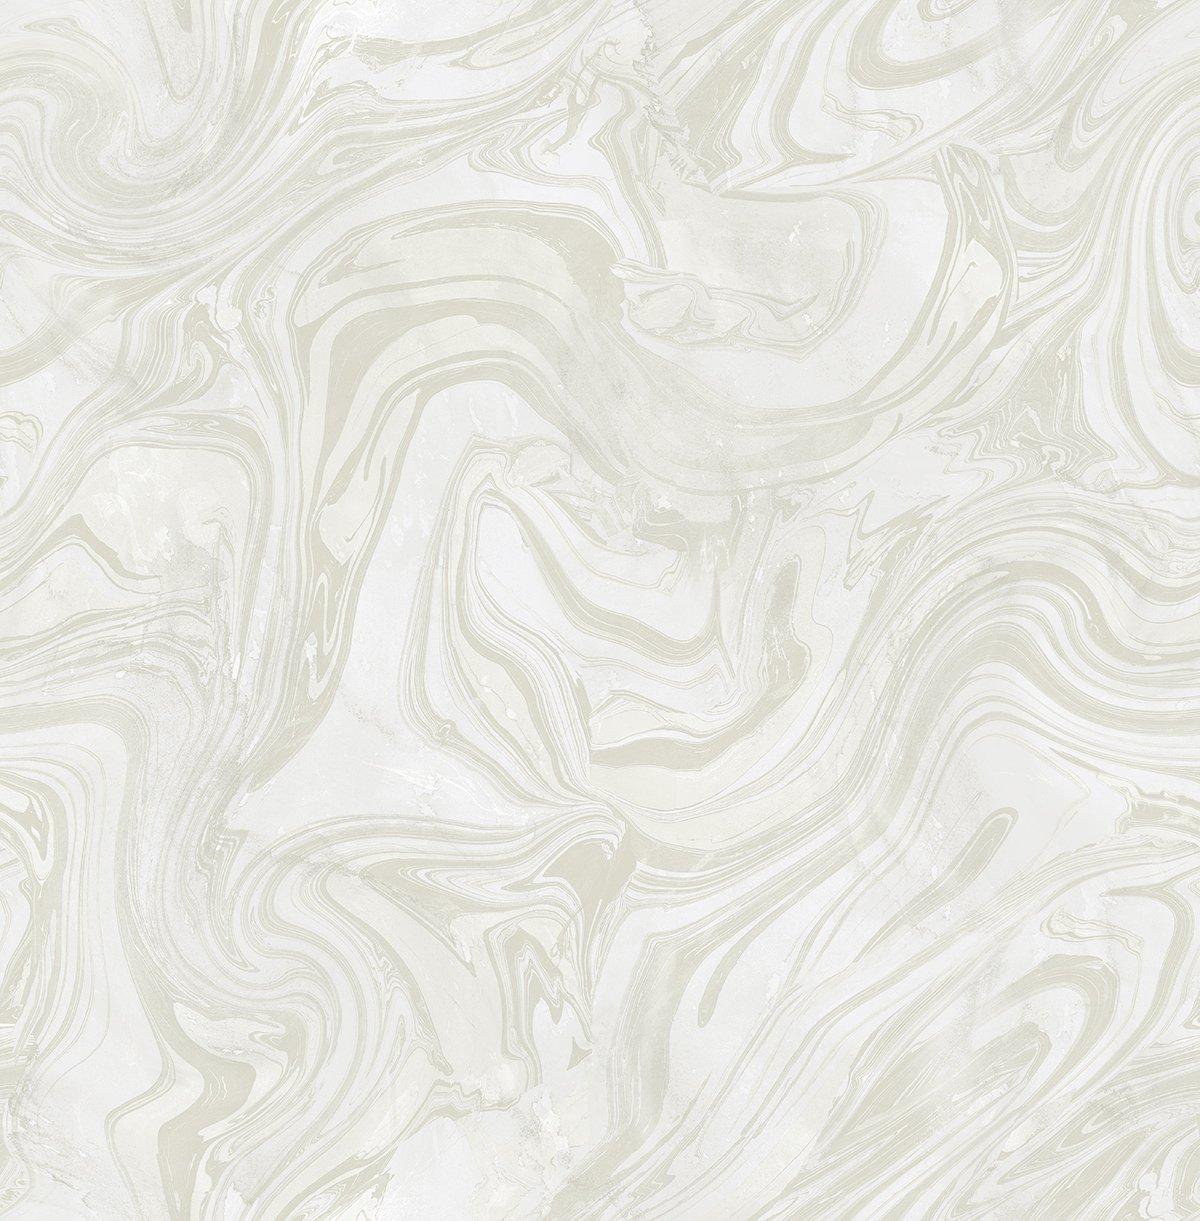 Zebra Wallpaper Petra (Frost) White Silver Marble Malachite Modern Luxury Boho